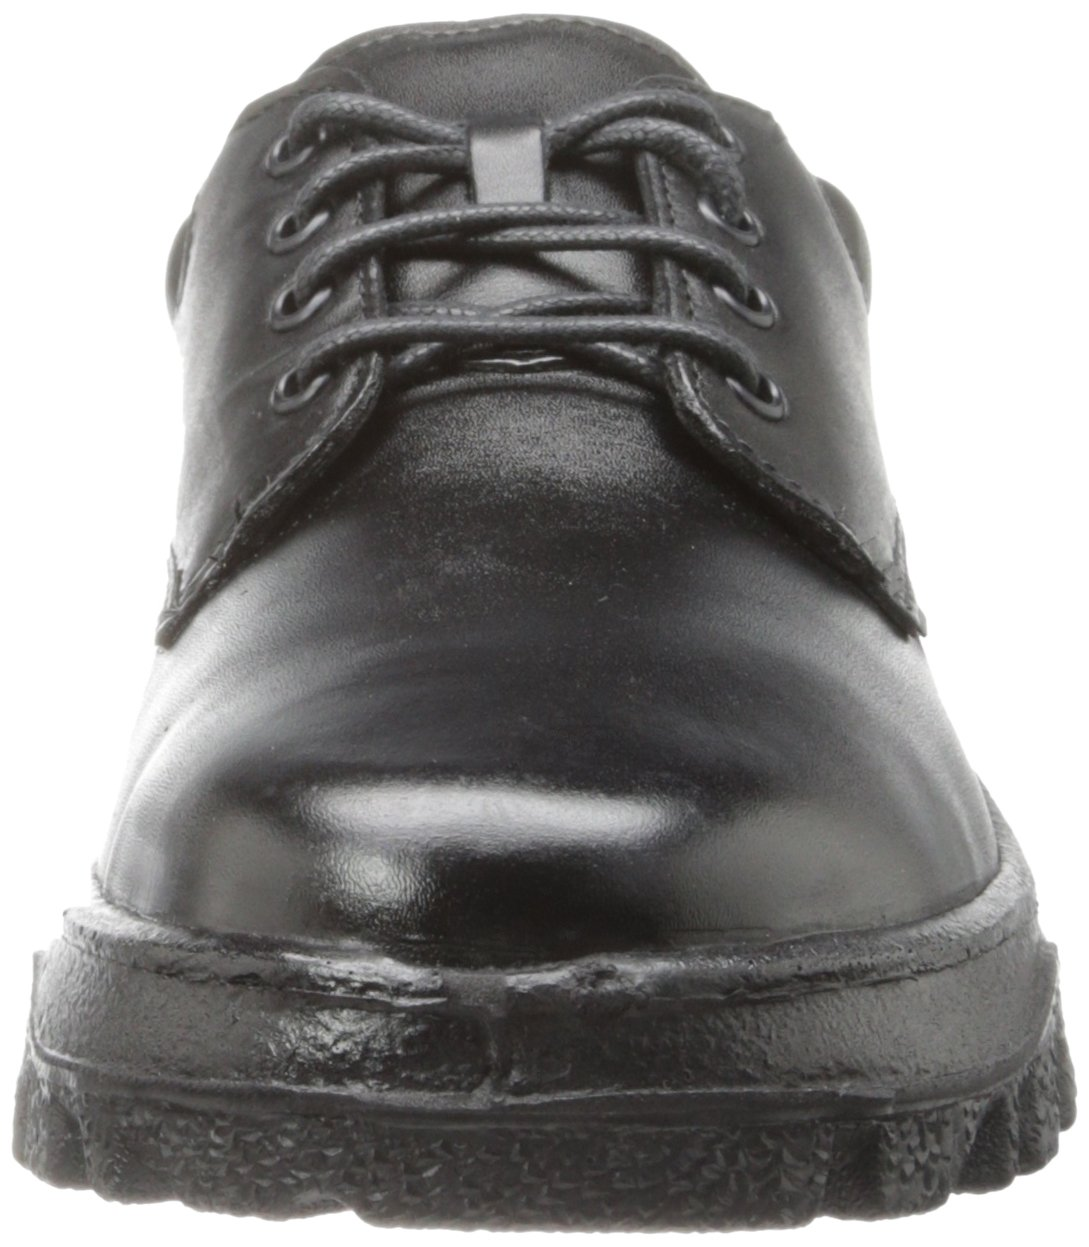 Rocky Men's Postal TMC Oxford Work Boot,Black,11.5 M US by Rocky (Image #4)